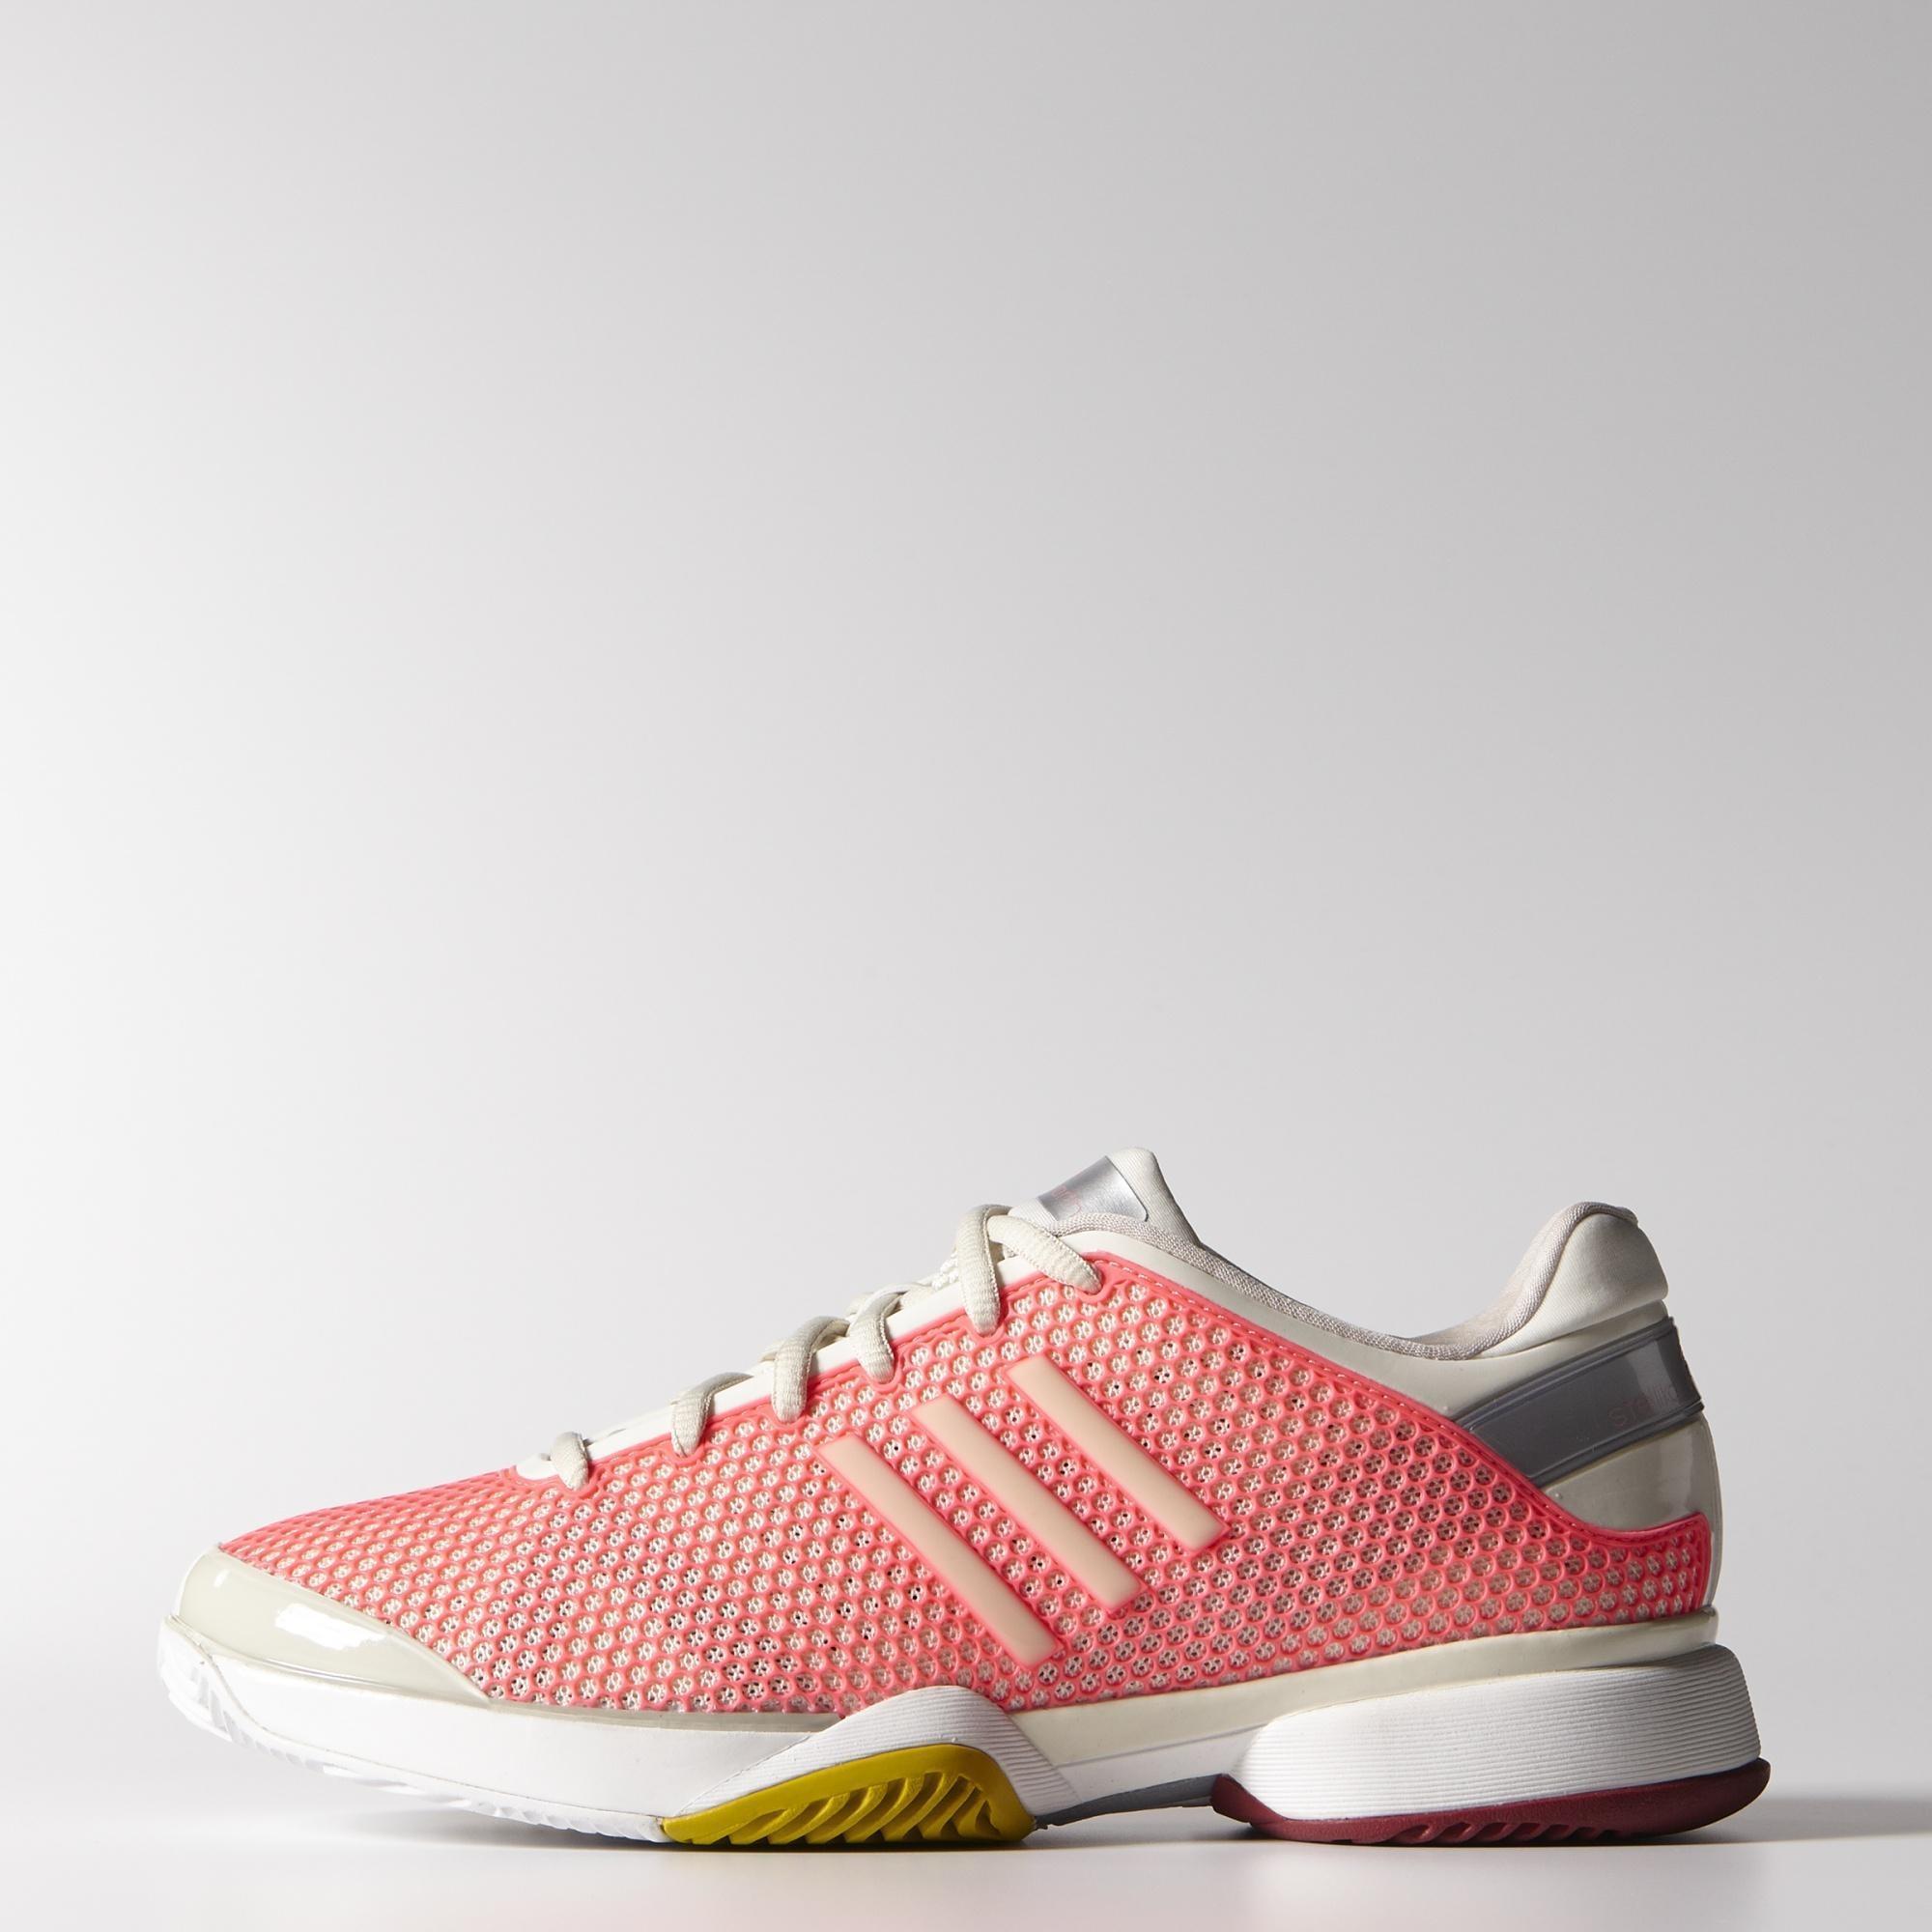 Adidas Womens Stella McCartney Barricade 8 Tennis Shoes - Pink/White